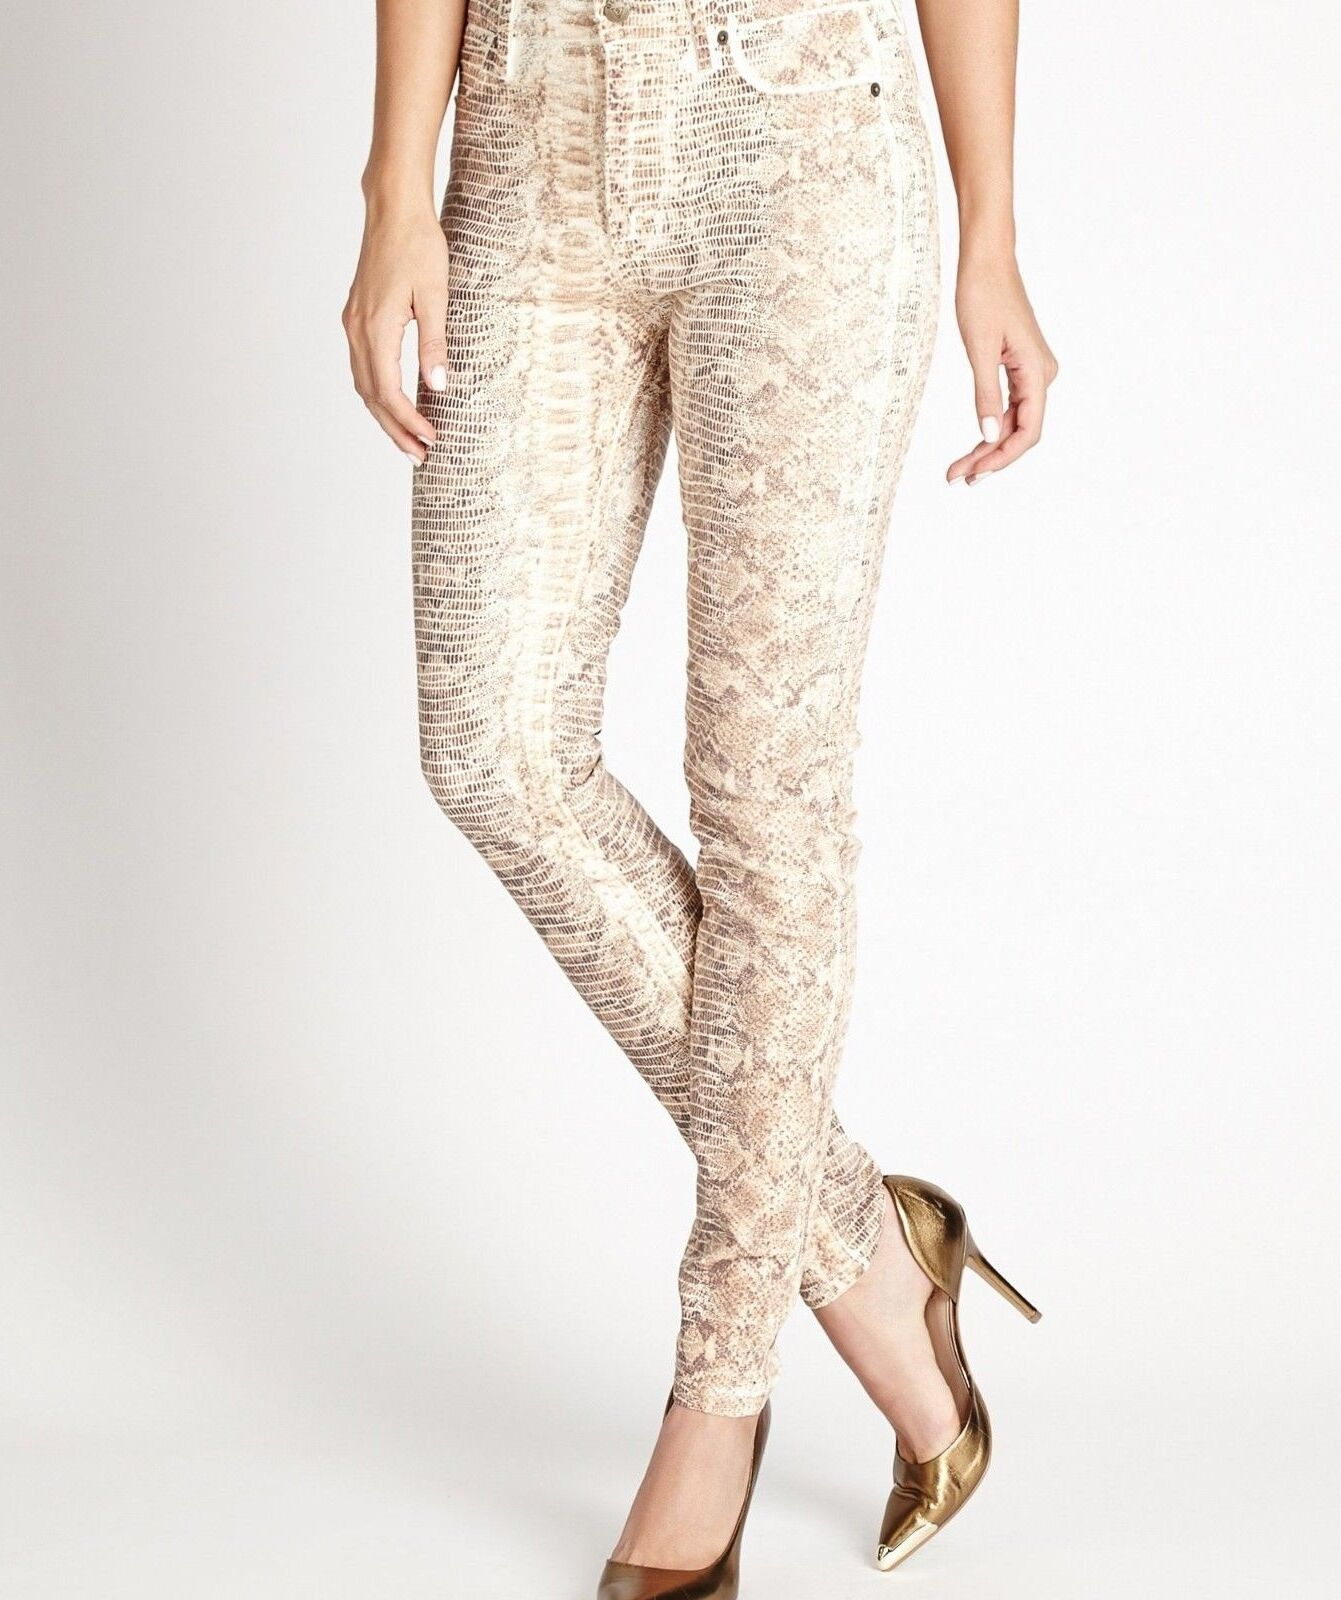 GUESS Women's High-Rise Power Skinny Jeans - Milk Snake Foil Wash sz 29